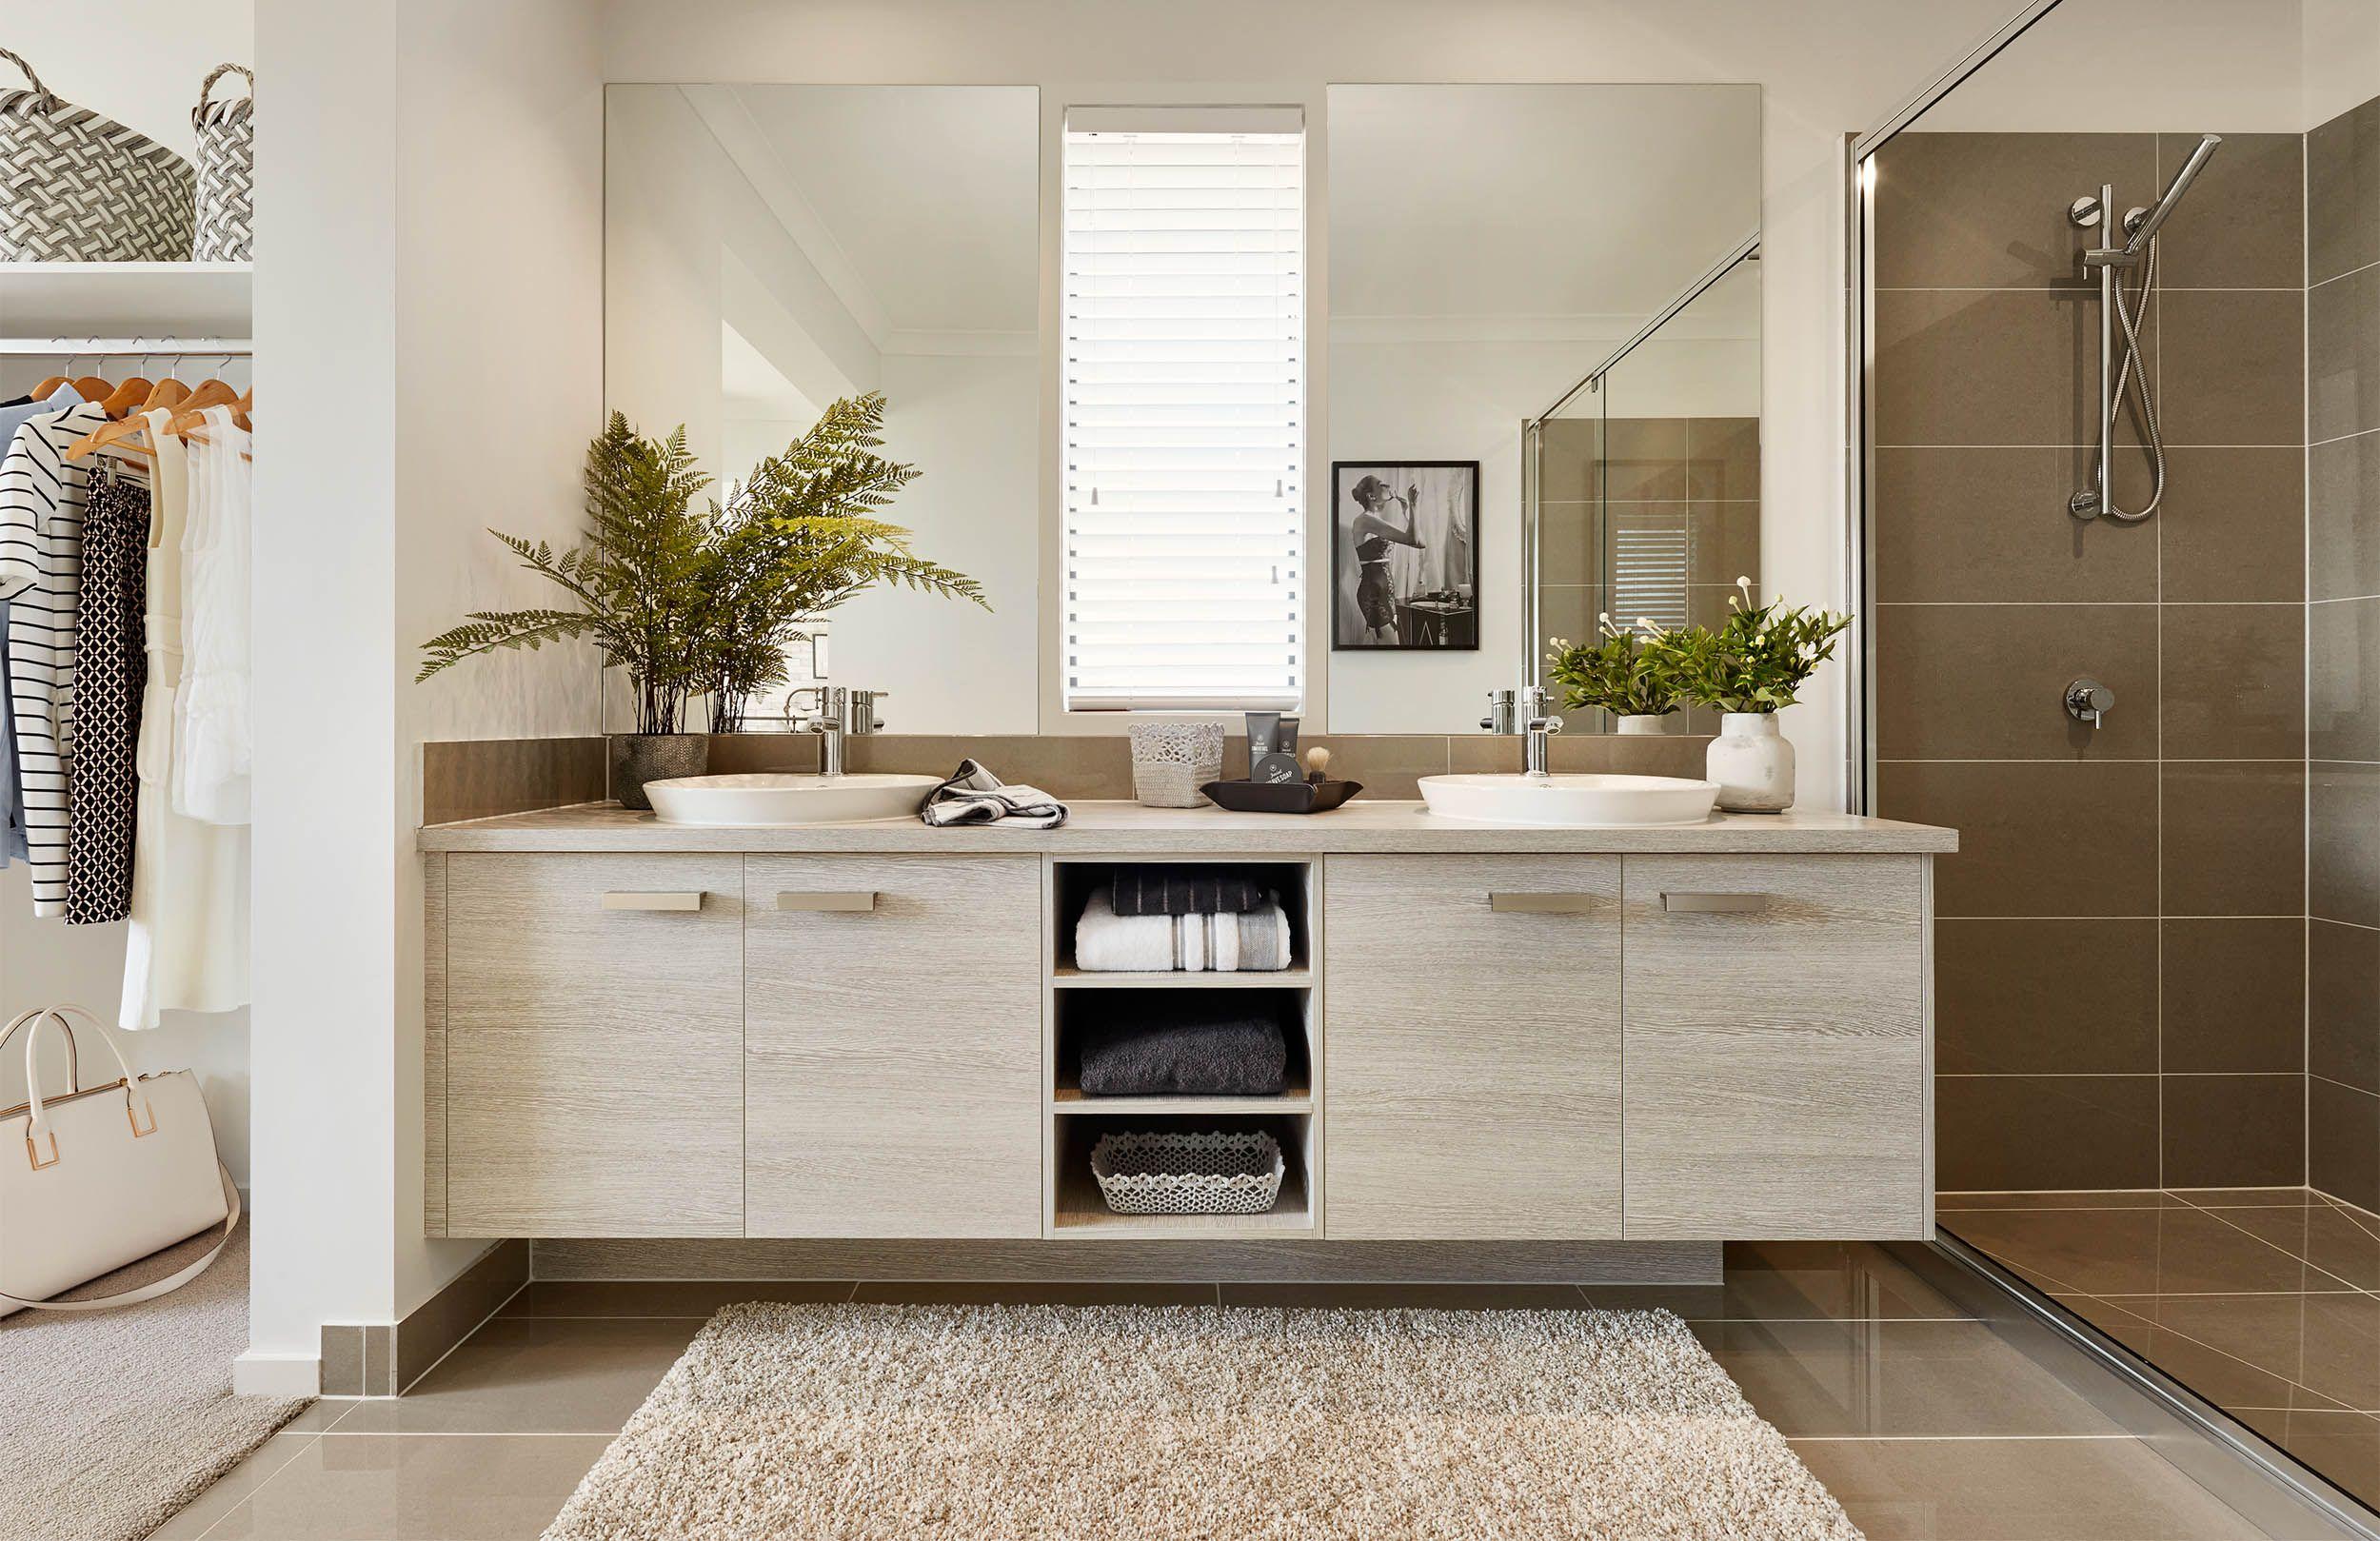 Carlisle Homes Colorado 37  Featured At Harpley Estate Custom Master Ensuite Bathroom Designs Inspiration Design